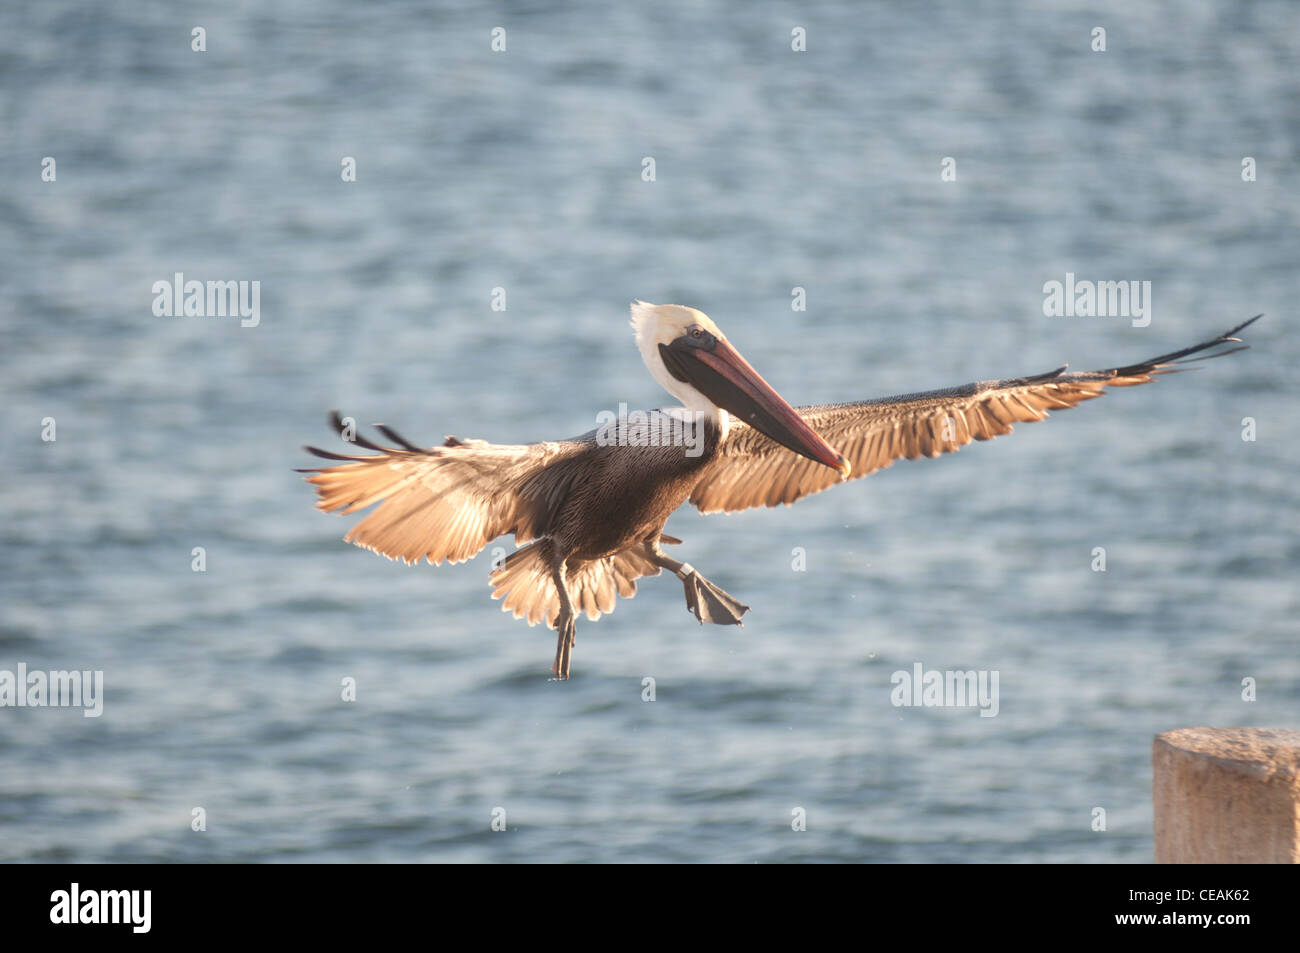 Pelicano café, Pelecanus occidentalis, volando, Florida, América del Norte, EE.UU. Imagen De Stock